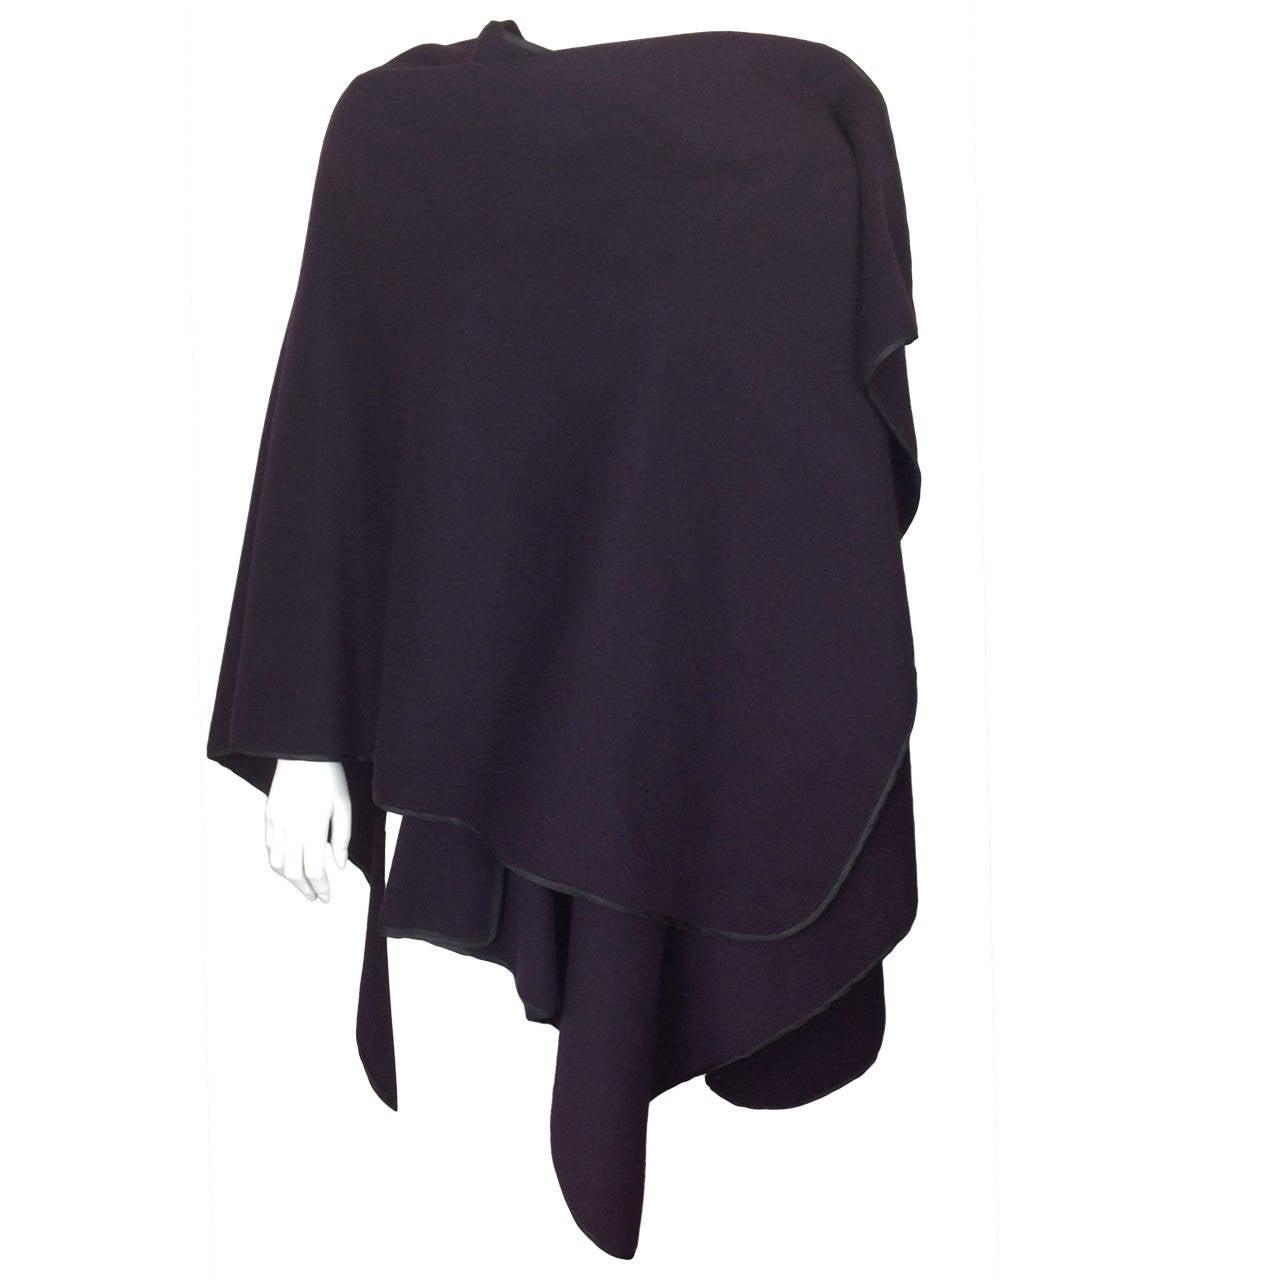 Capas Sesena violet poncho 1